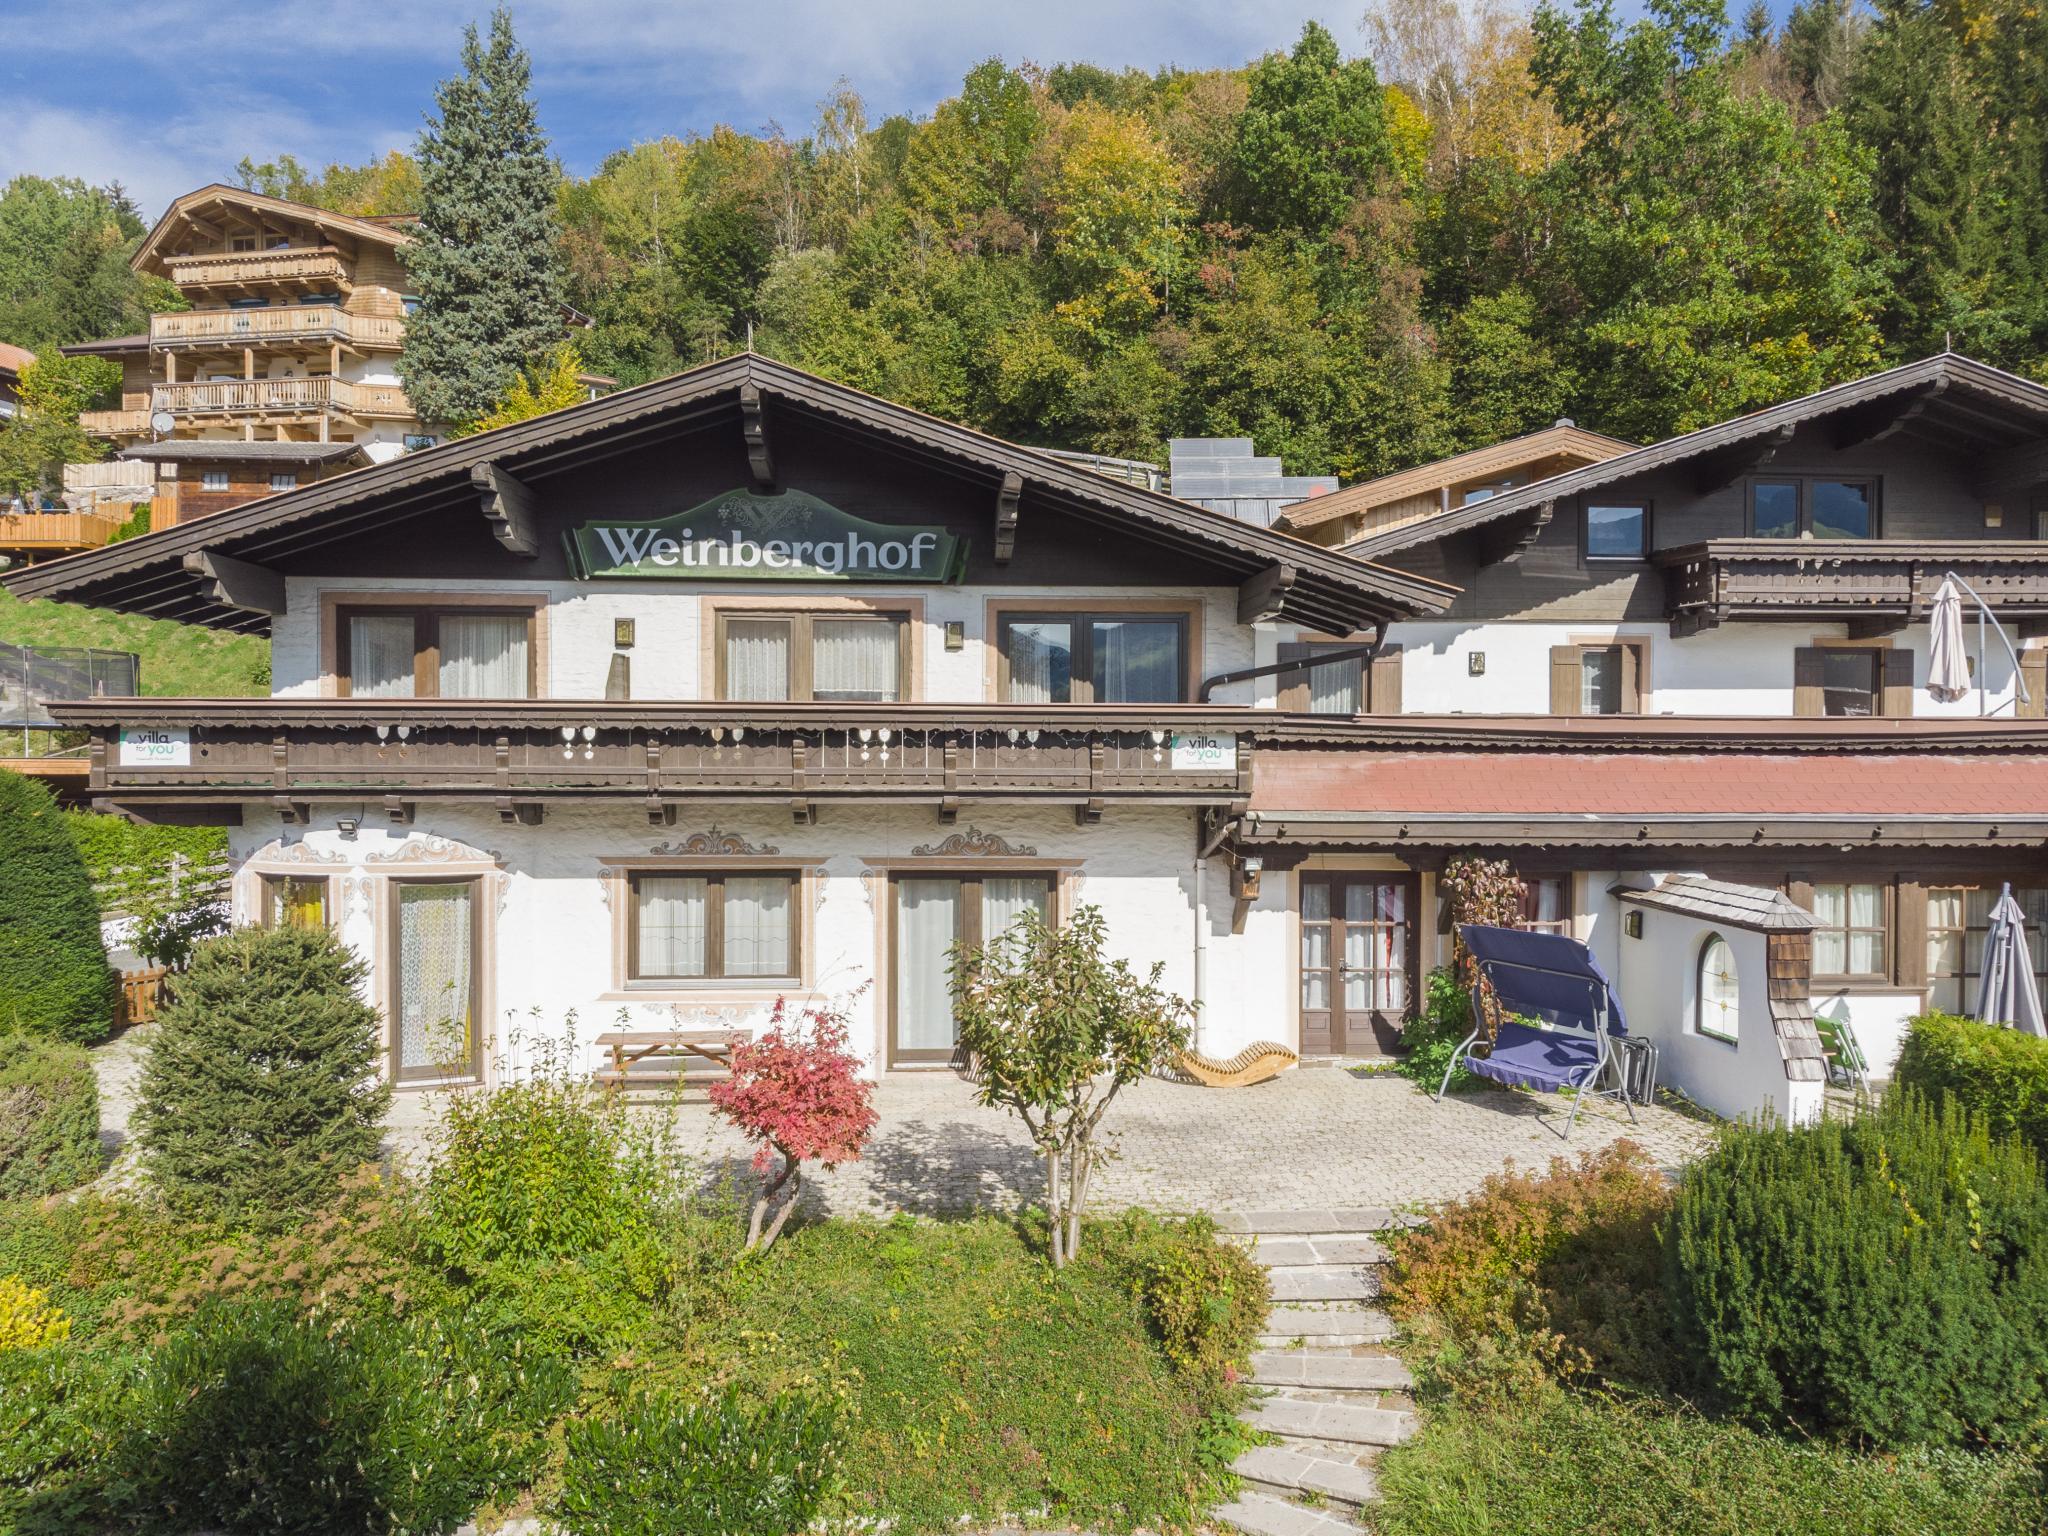 Weinberghof I Tirol